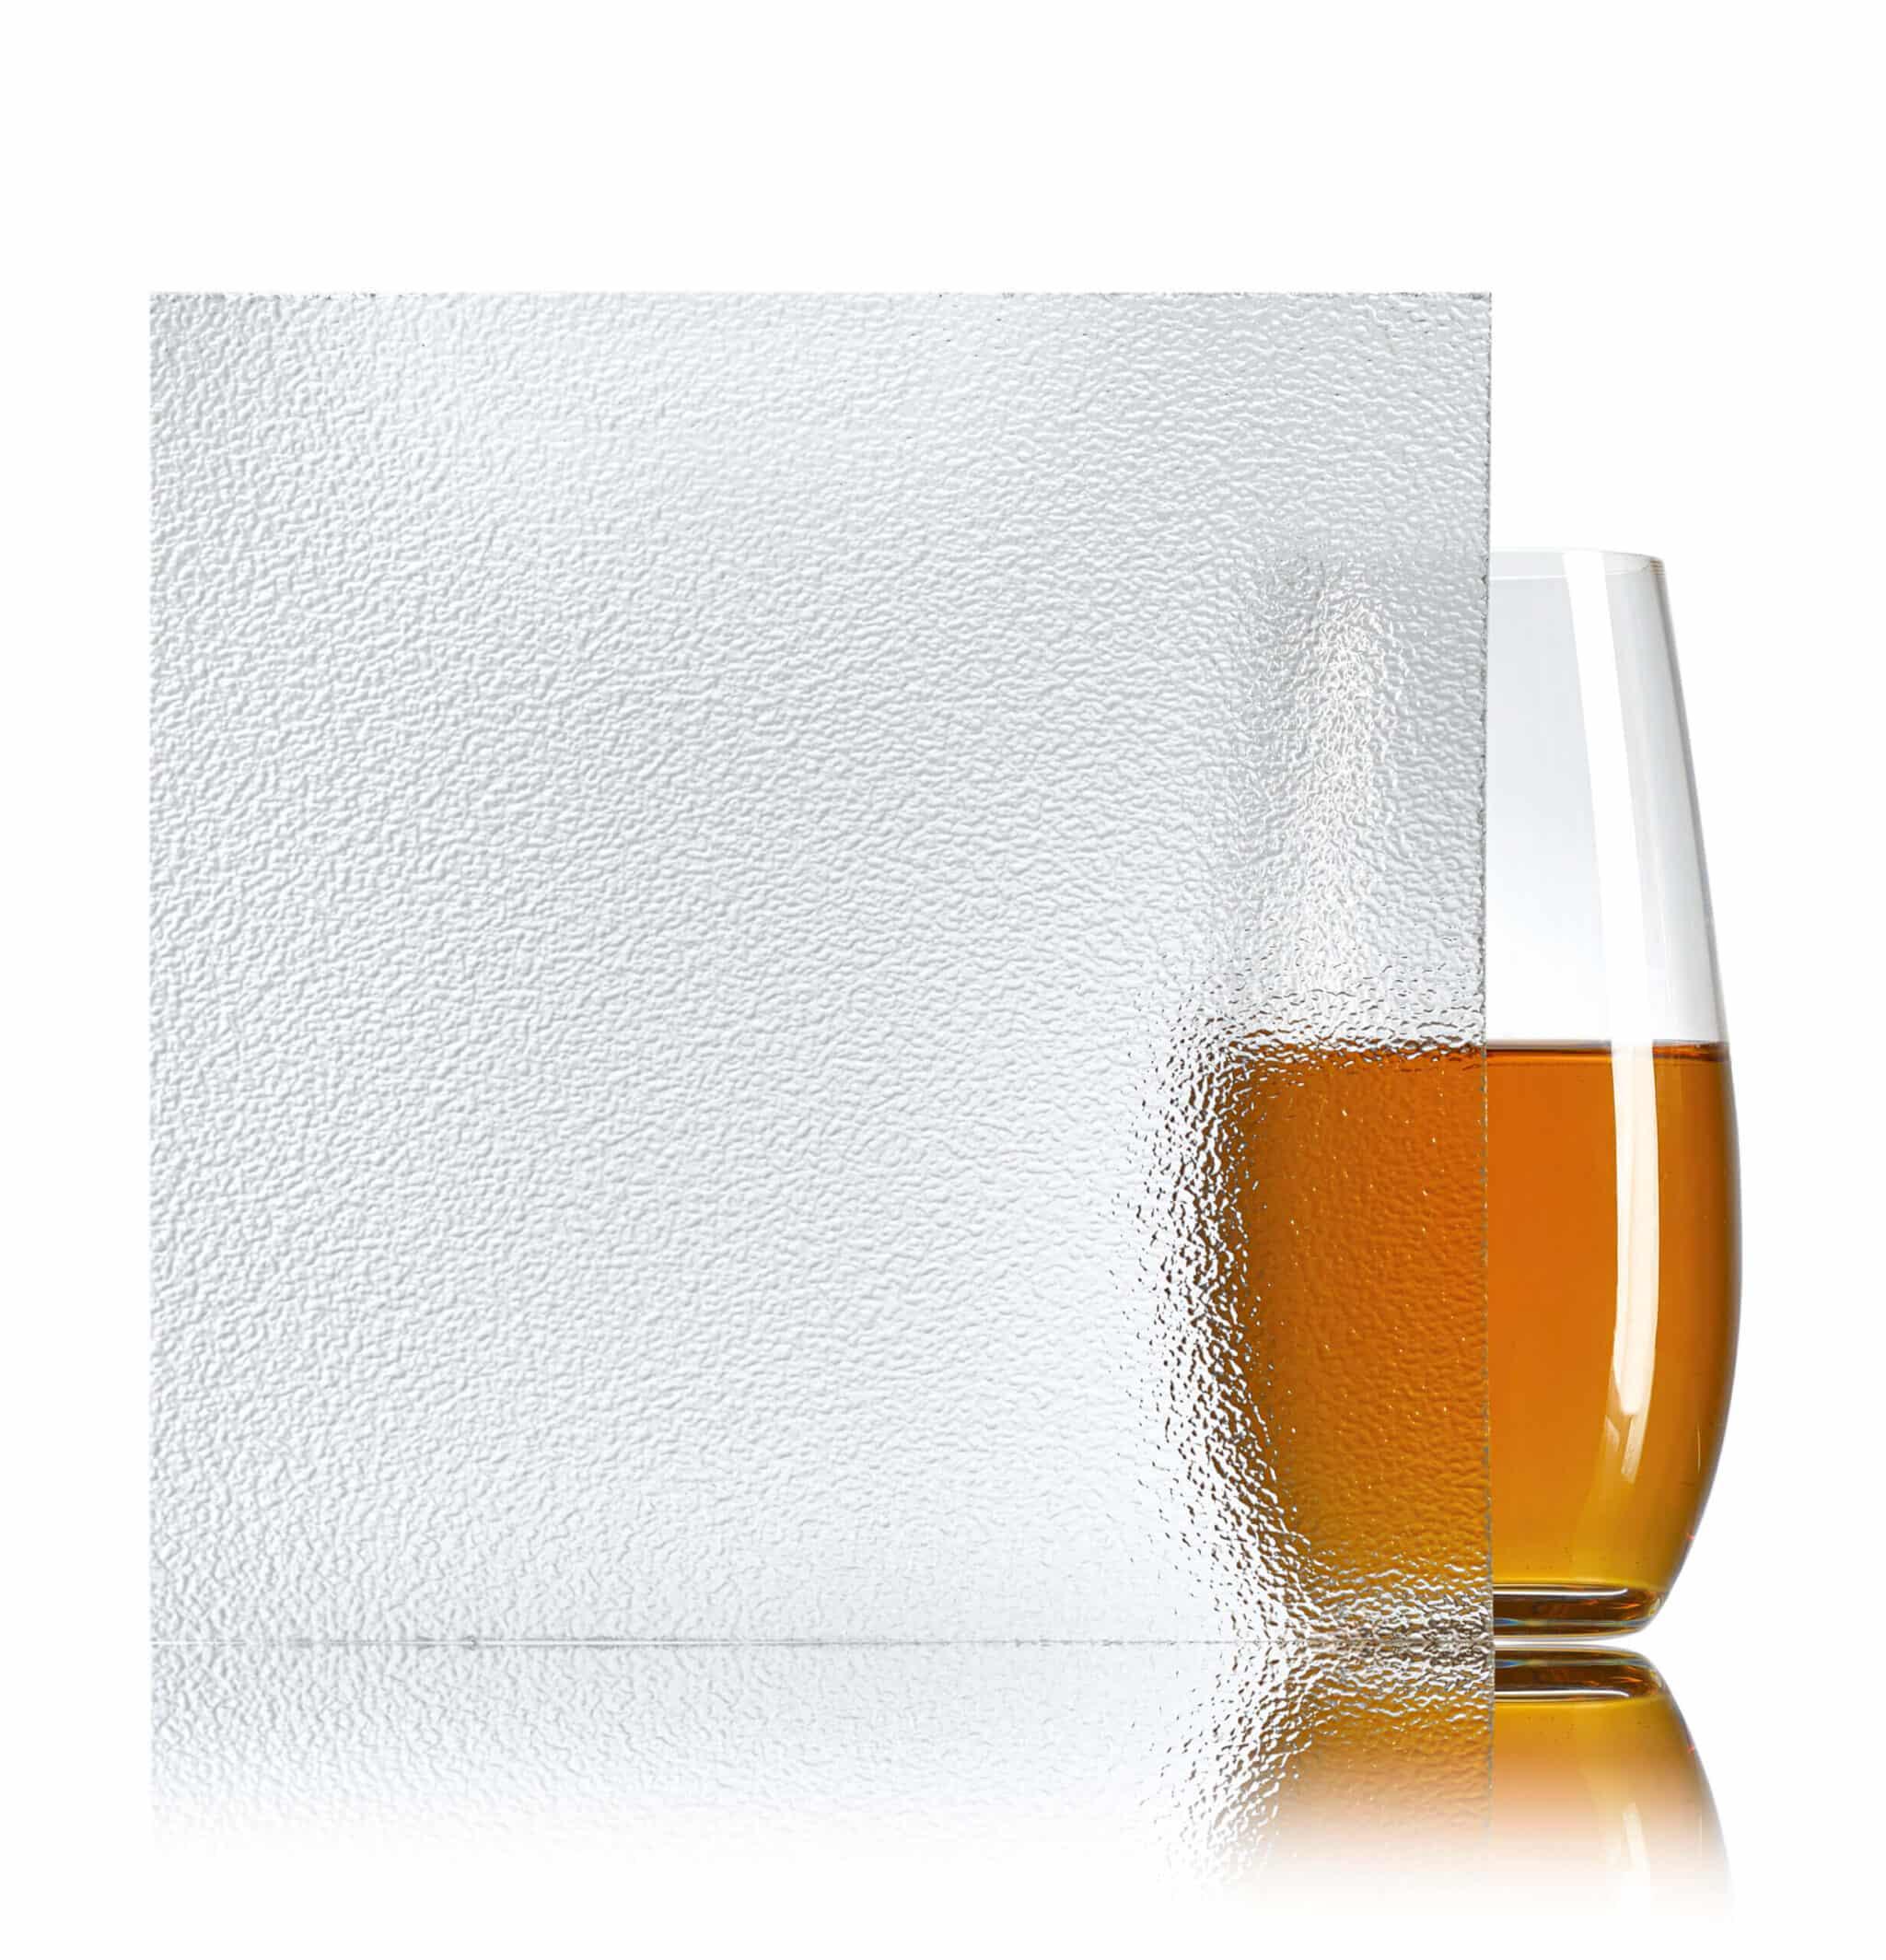 Pinhead Pattern Glass – Walker Glass